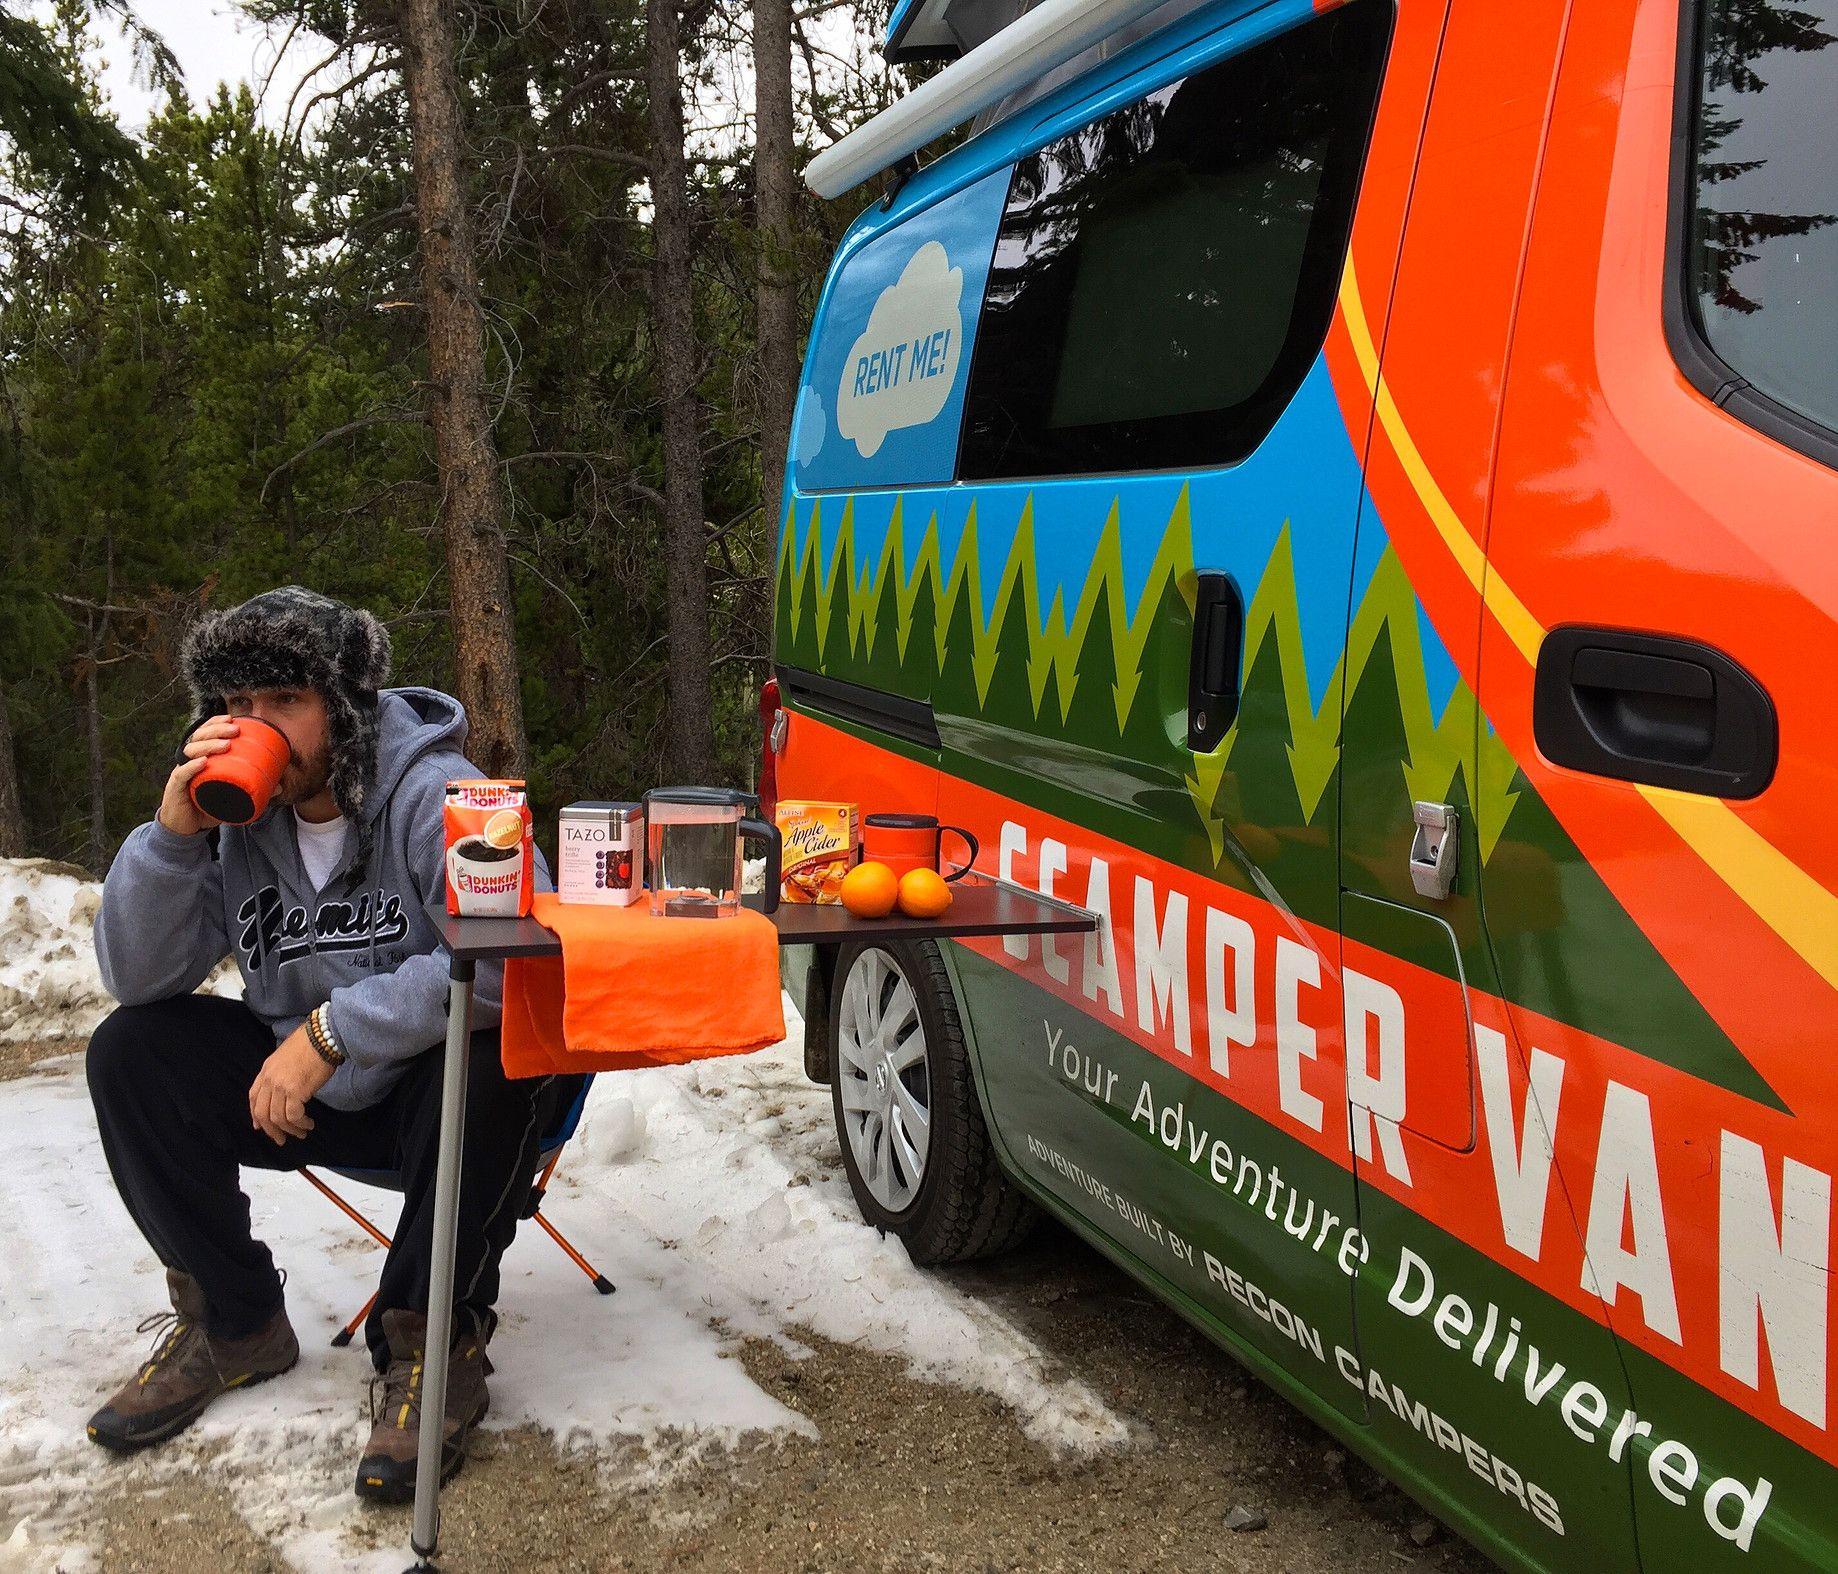 Camper rental in atlanta asheville scamper van